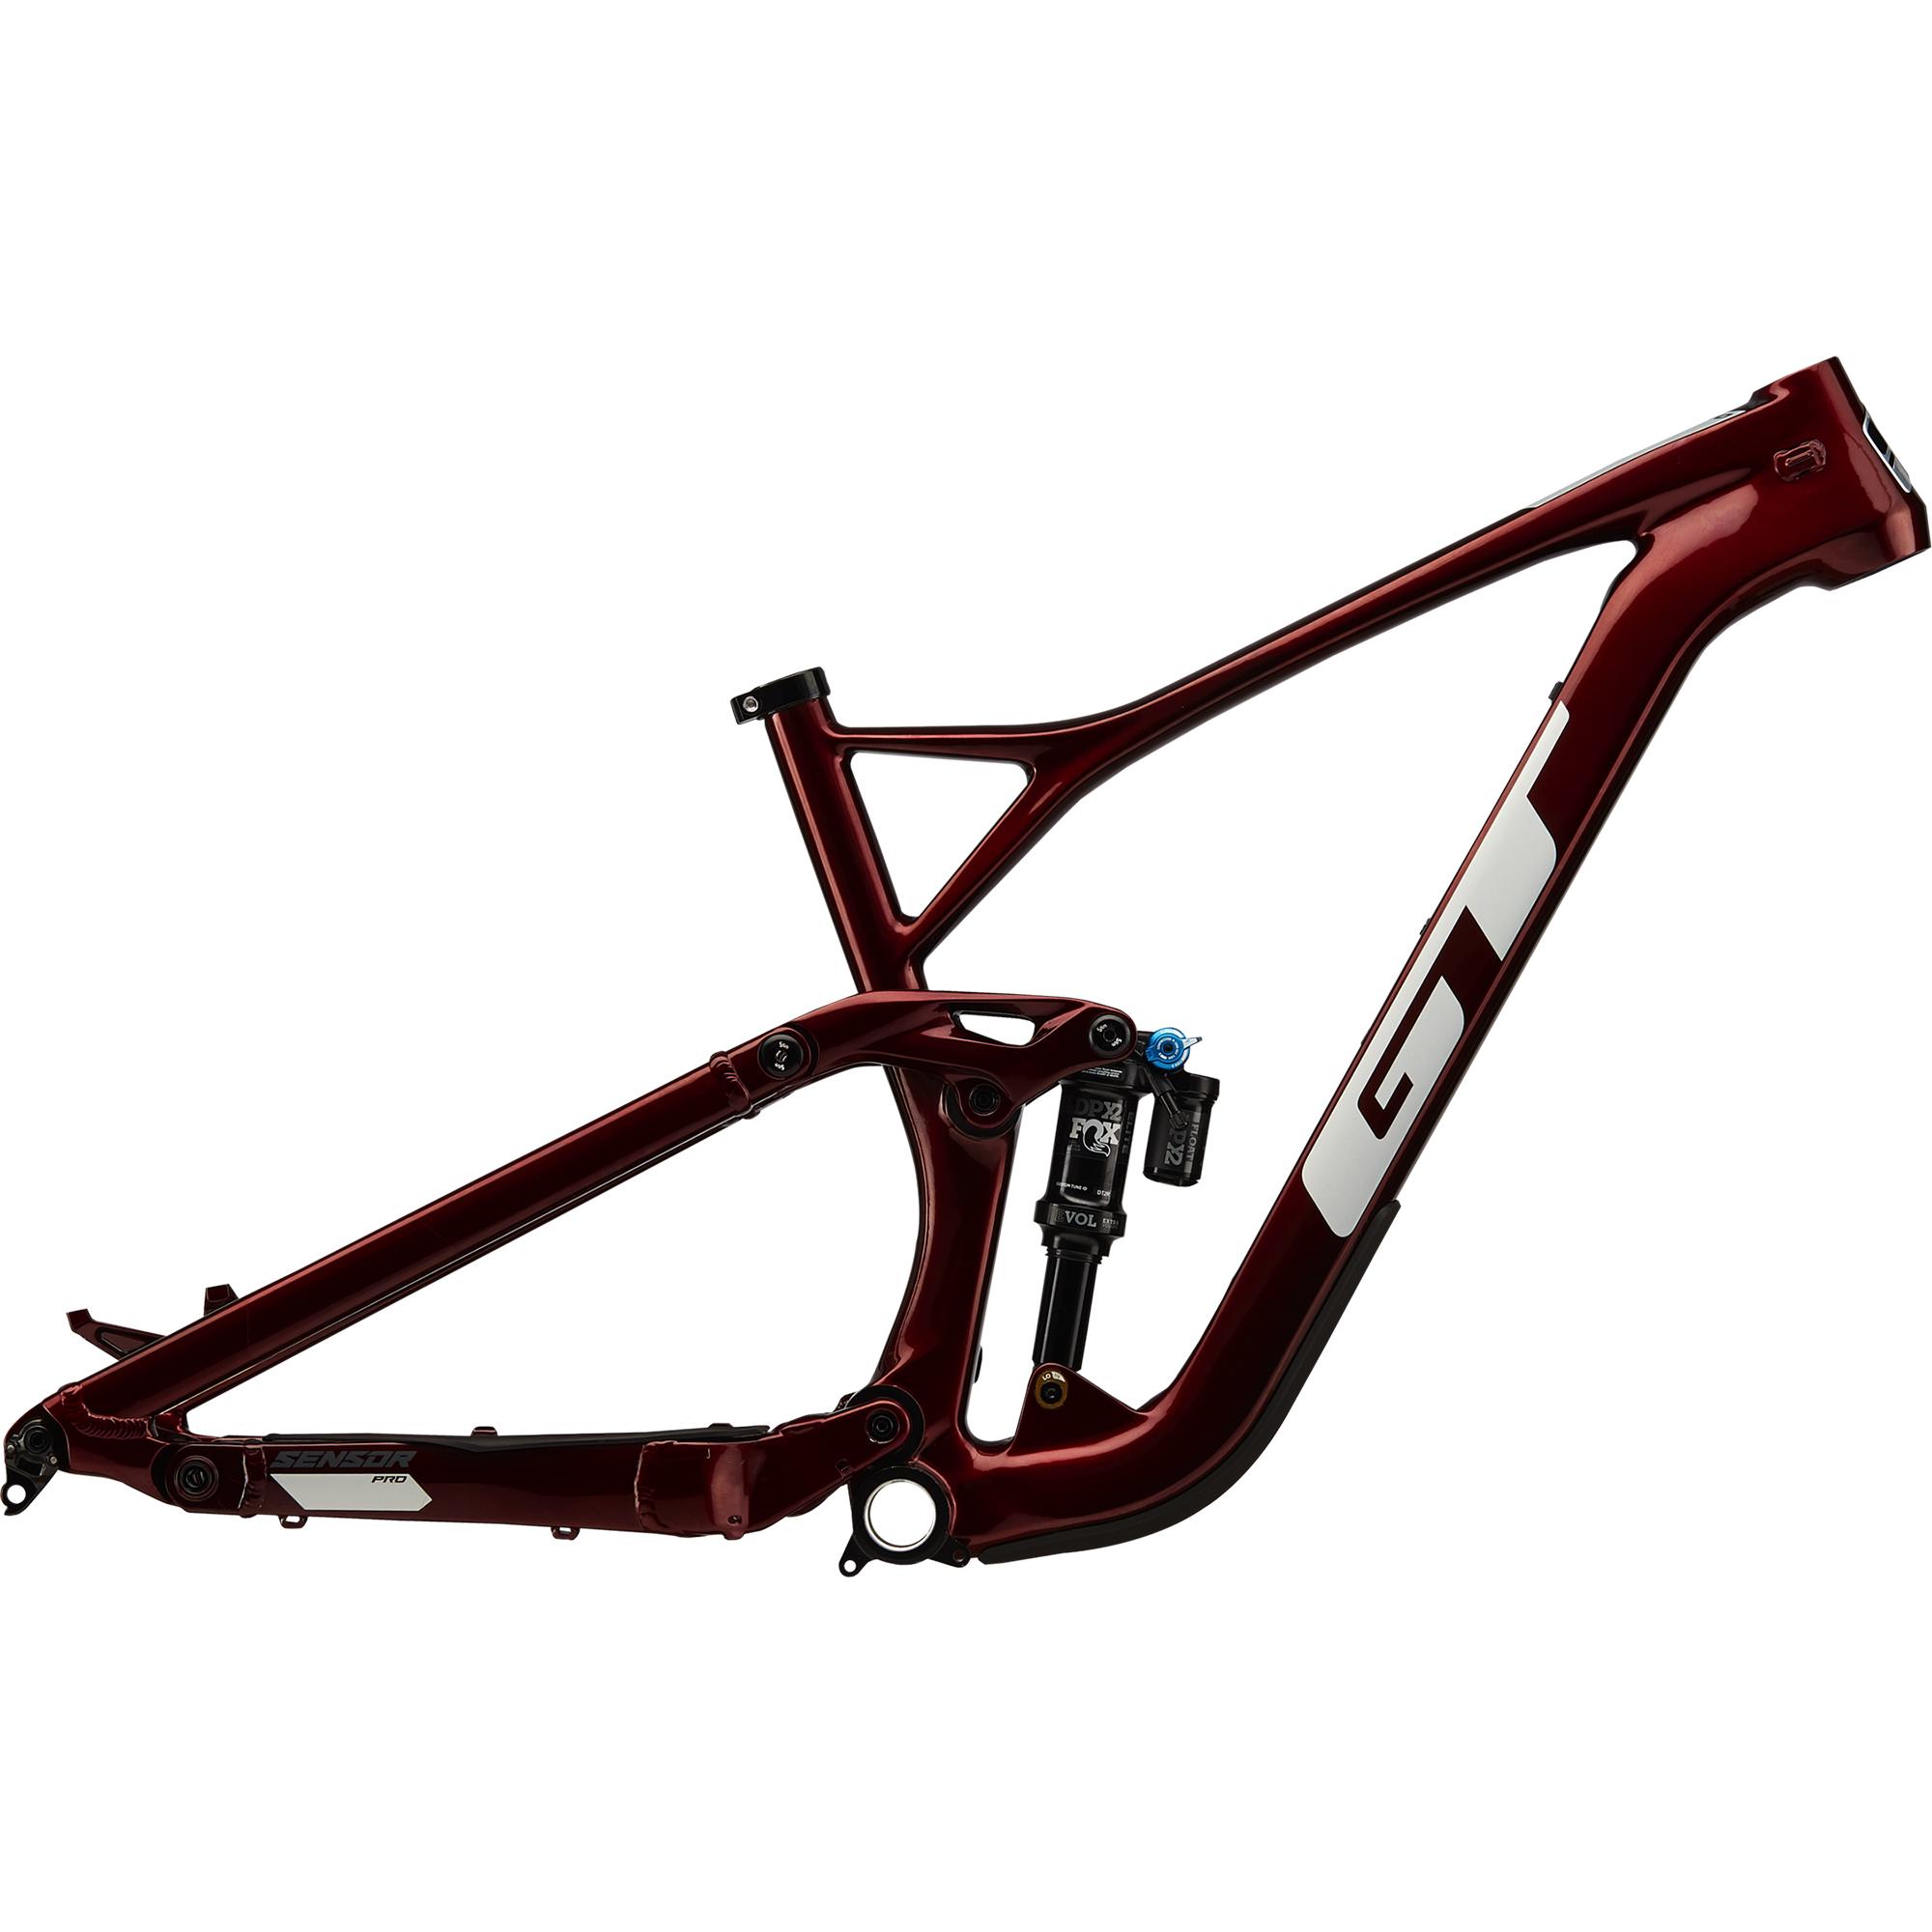 full-suspension carbon fiber bike frame